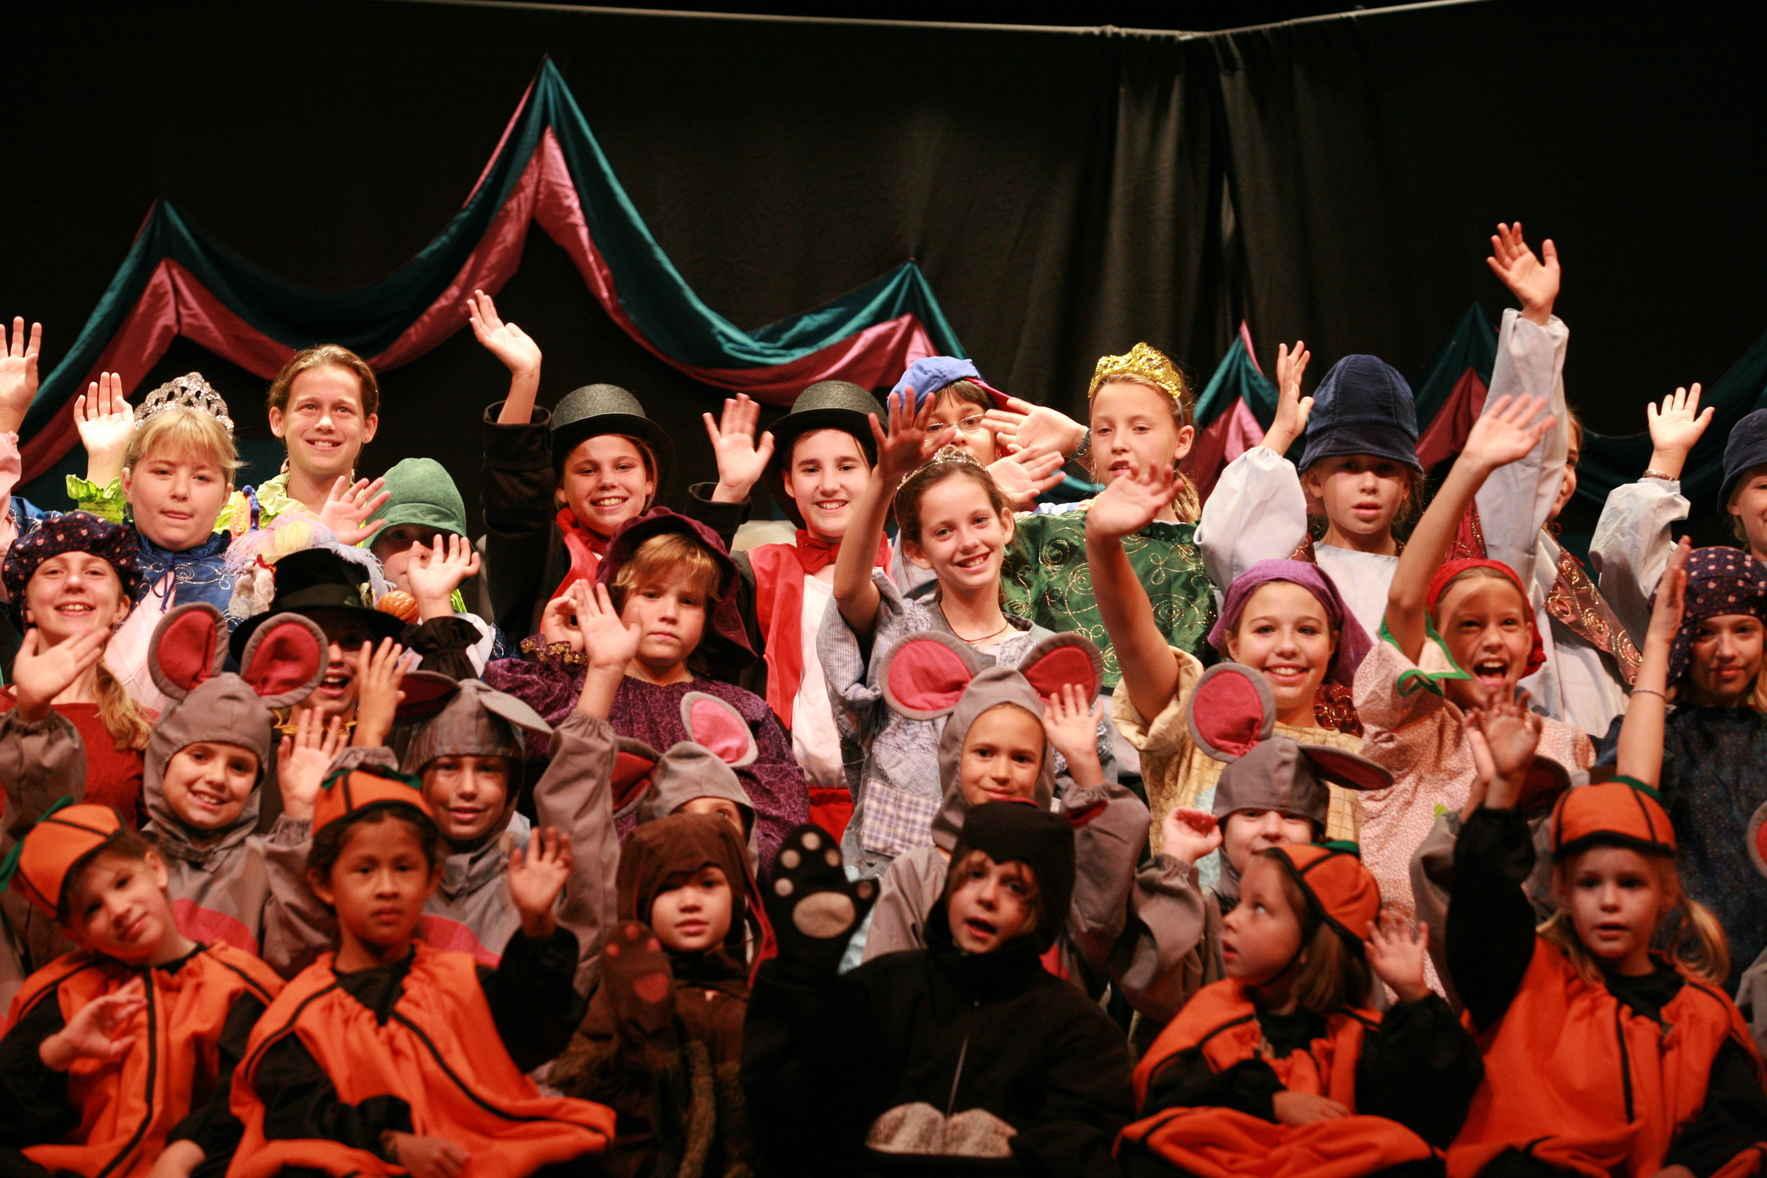 Missoula Children's Theatre's Cinderella 1:00 image